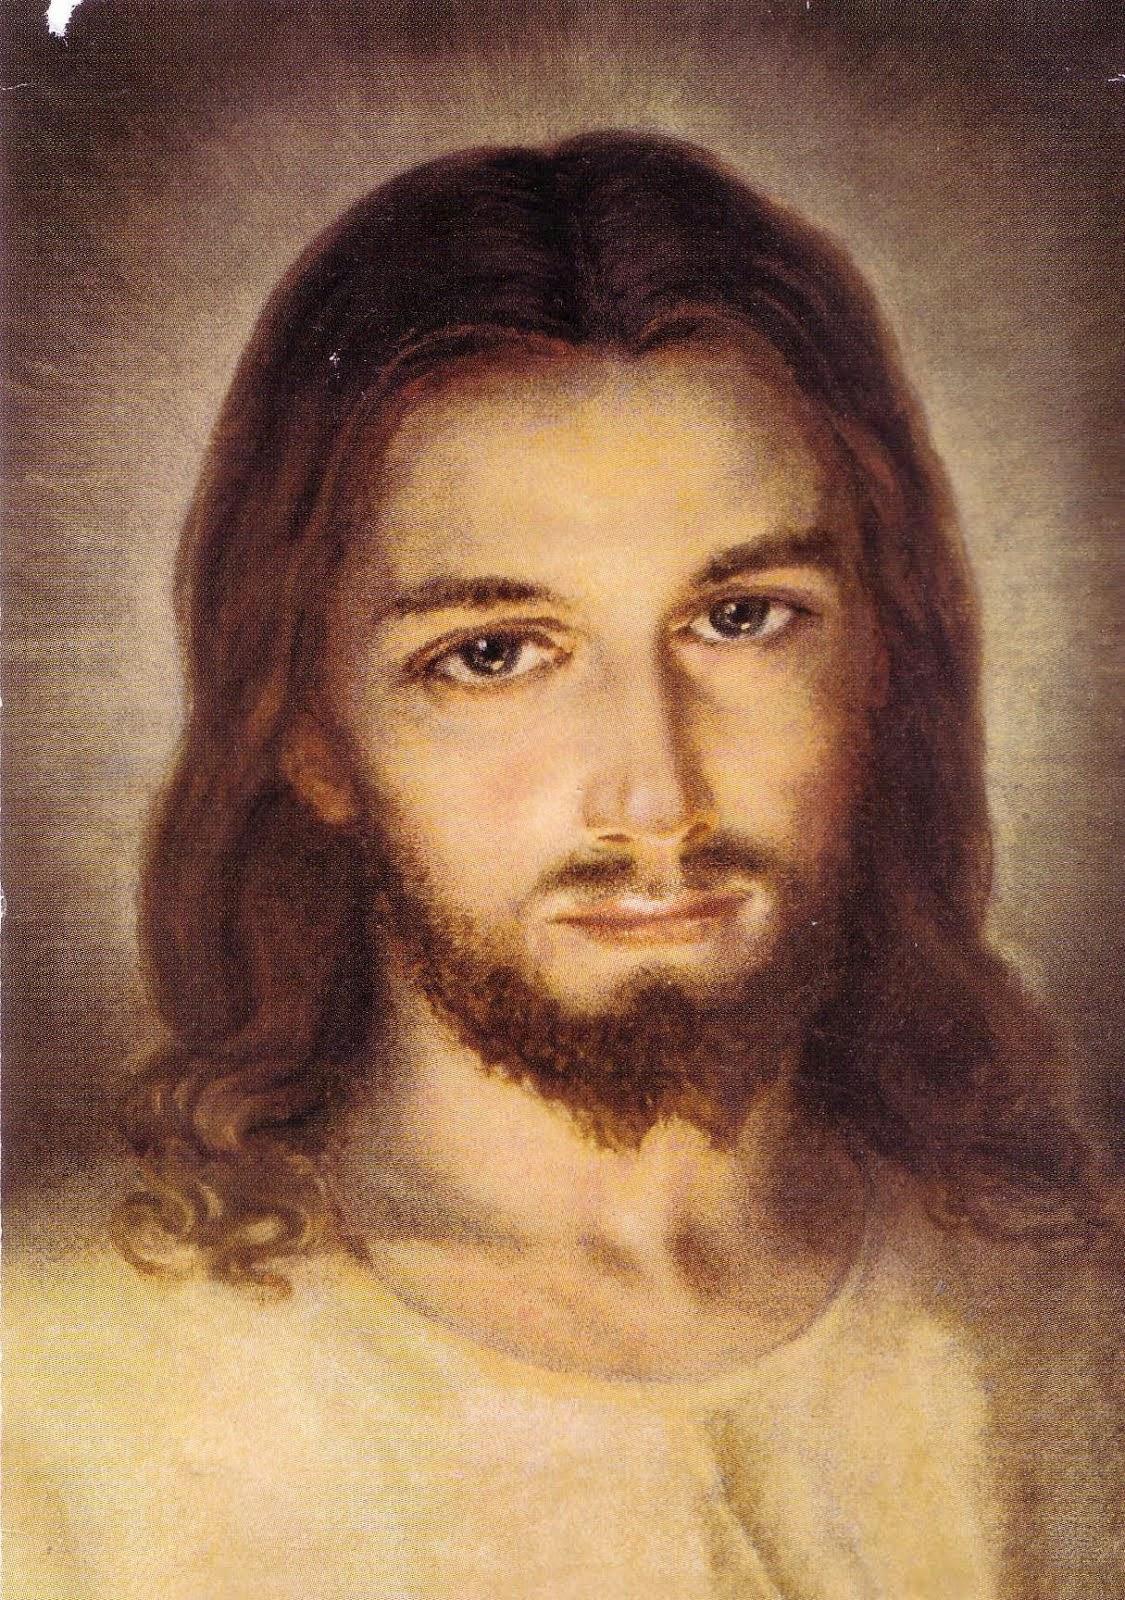 Jesus da Divina Misericórdia